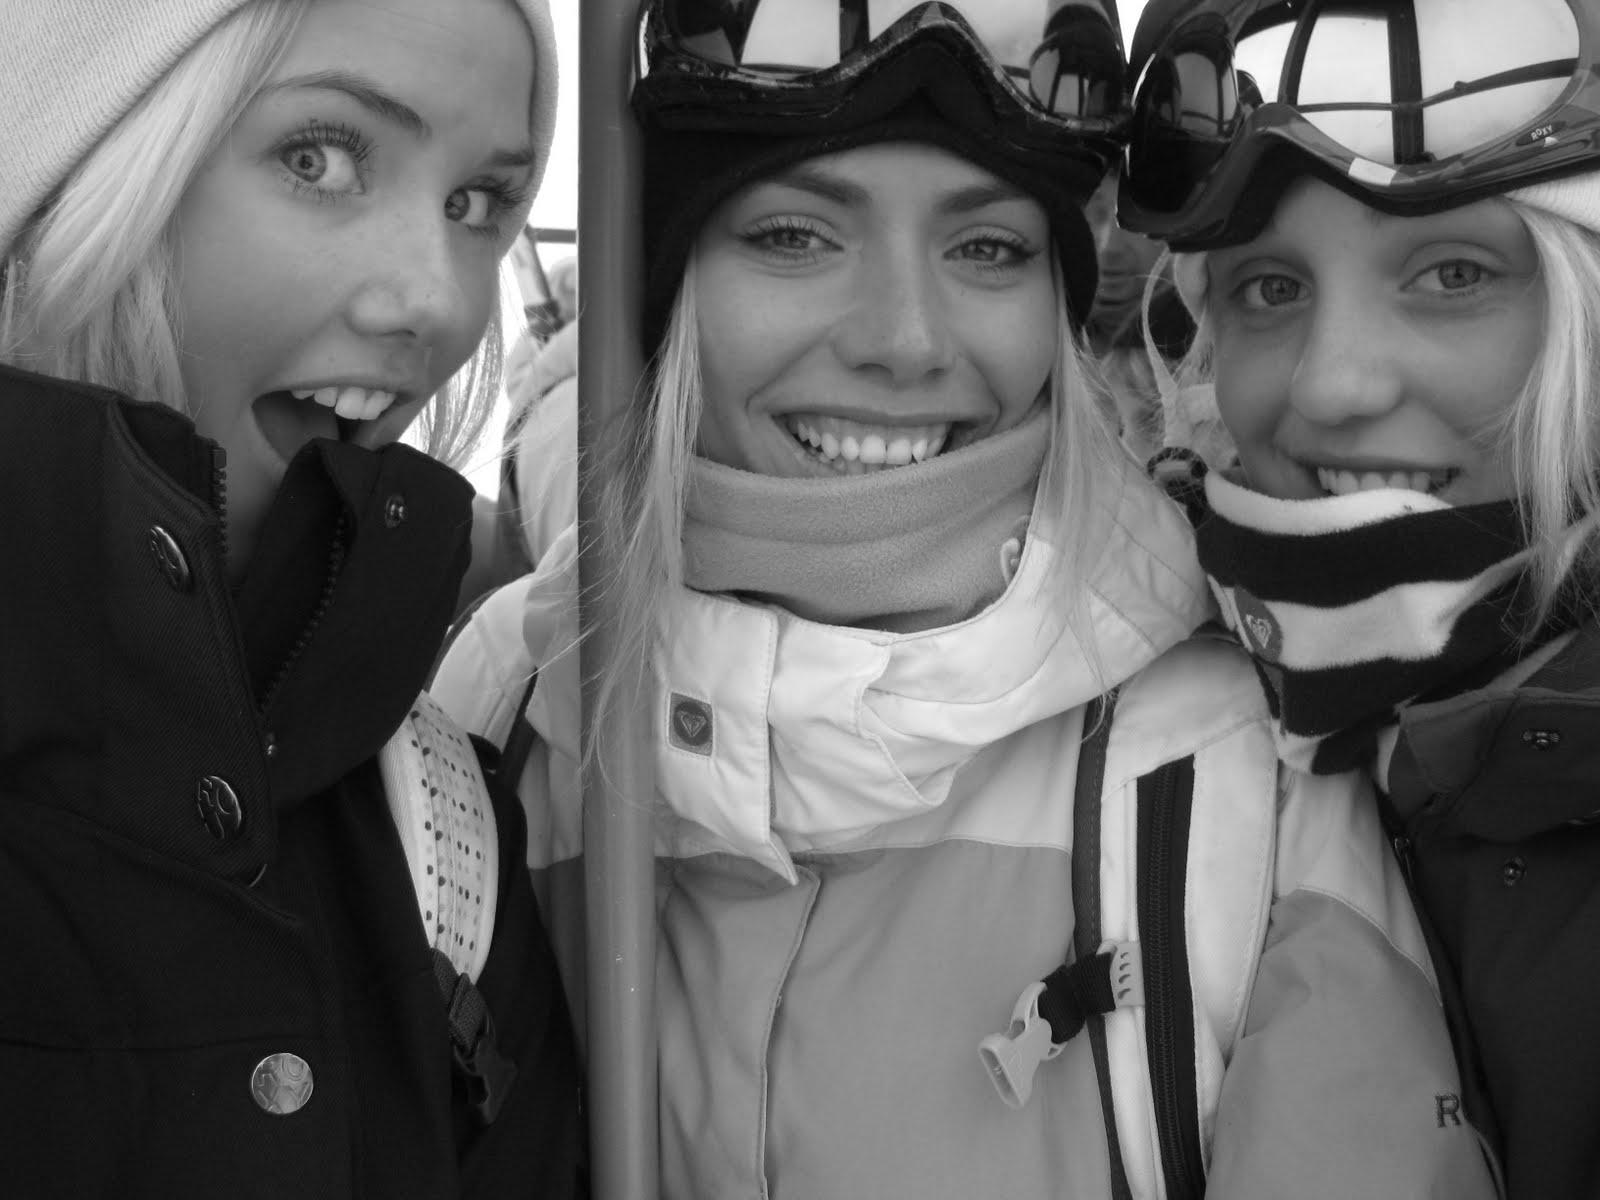 Silje Norendal Norwegian Snowboarder: Saas Fee is great ...  Silje Norendal ...